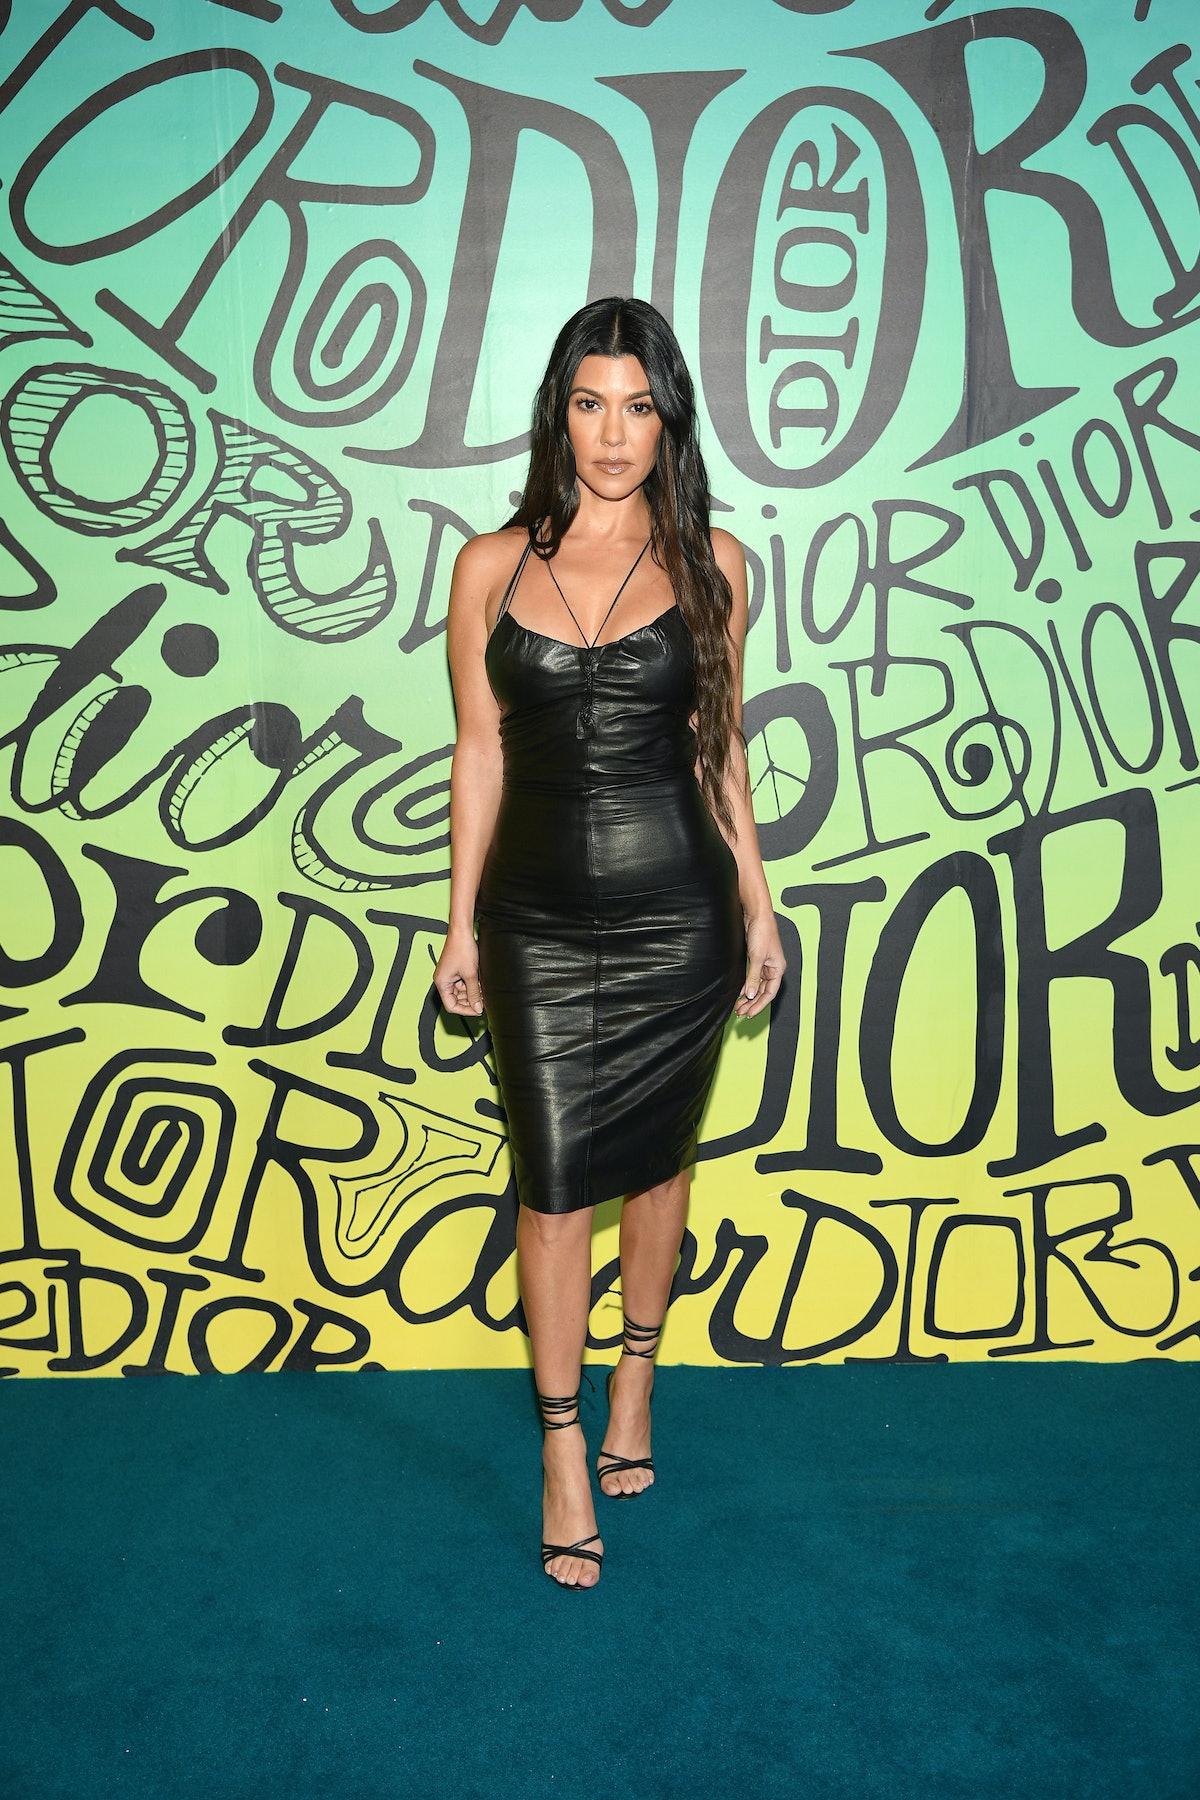 MIAMI, FLORIDA - DECEMBER 03: Kourtney Kardashian attends the Dior Men's Fall 2020 Runway Show on De...